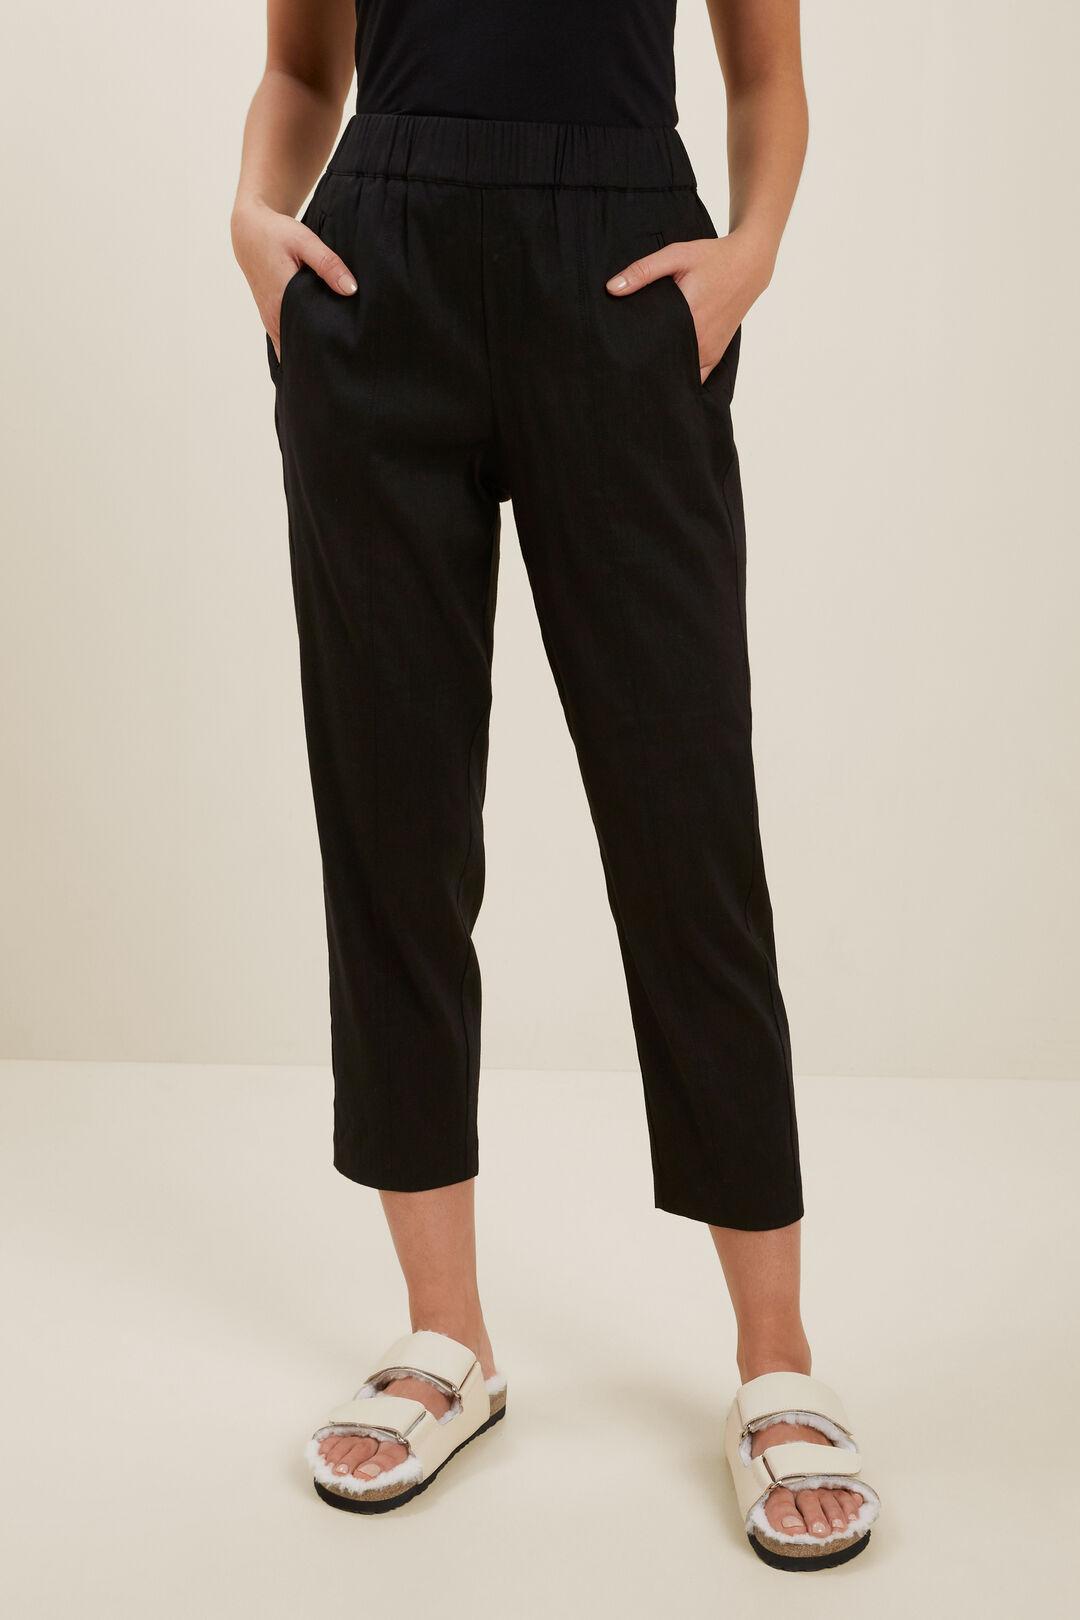 Slim Leg Pull On Pant  Black  hi-res